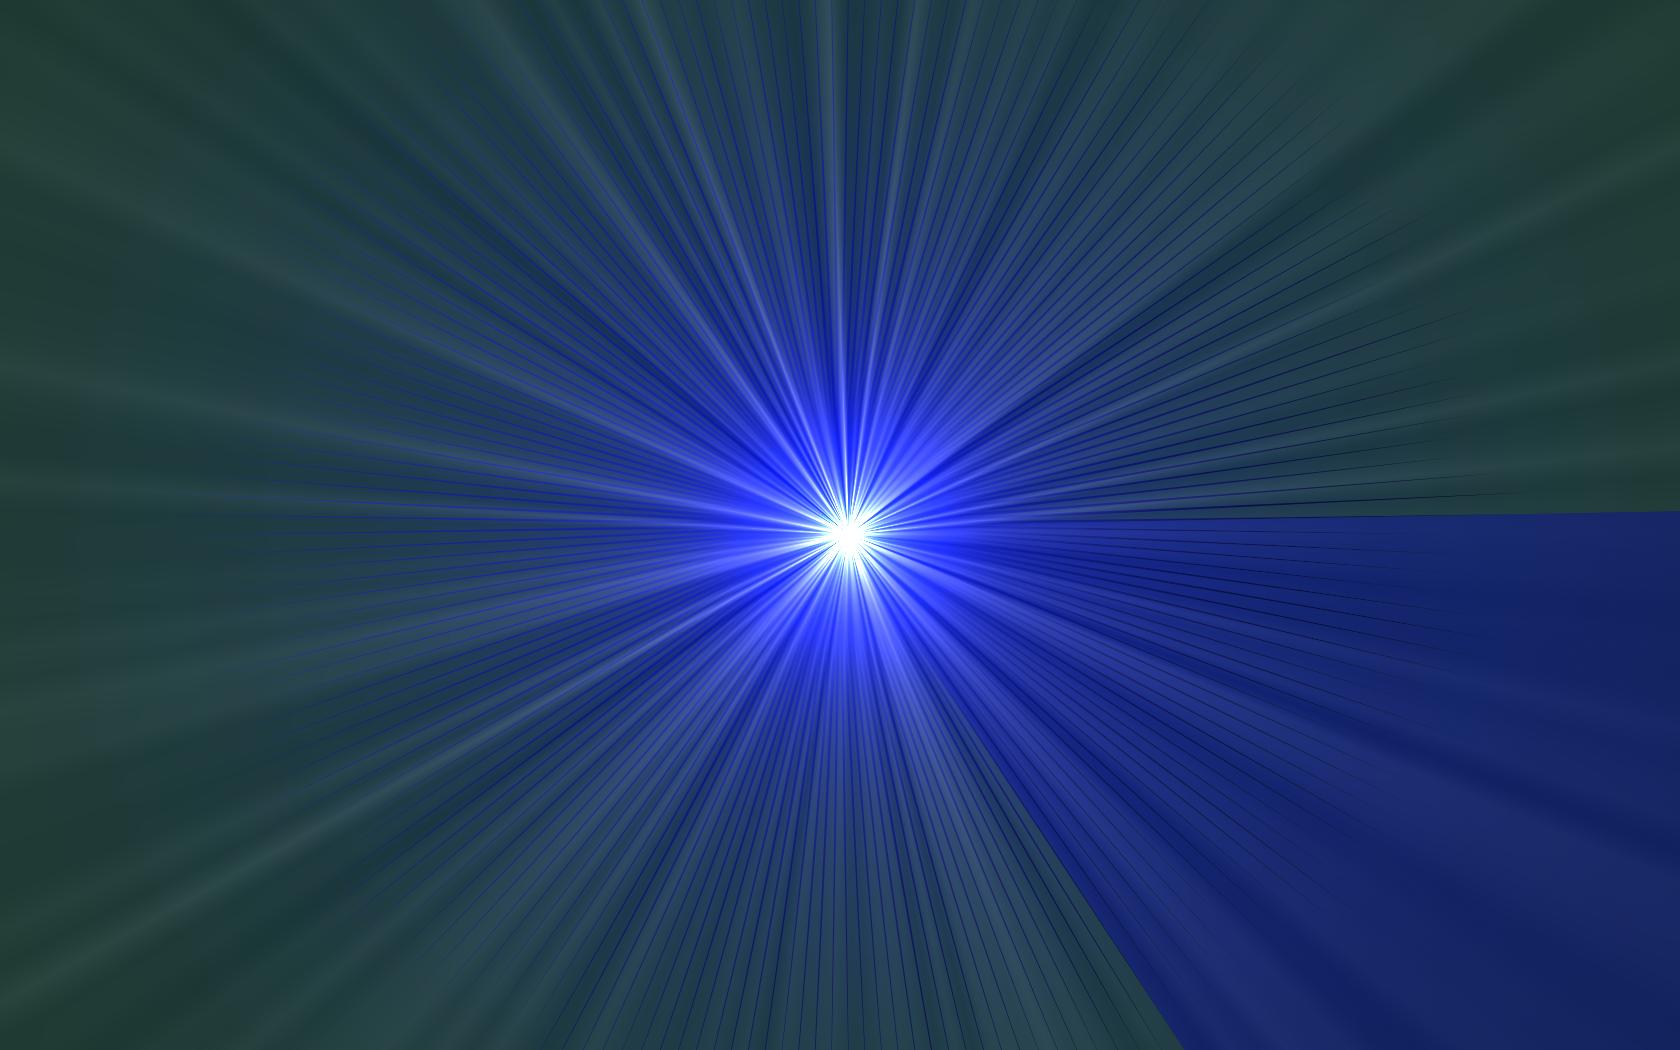 Light HD PNG - 95072